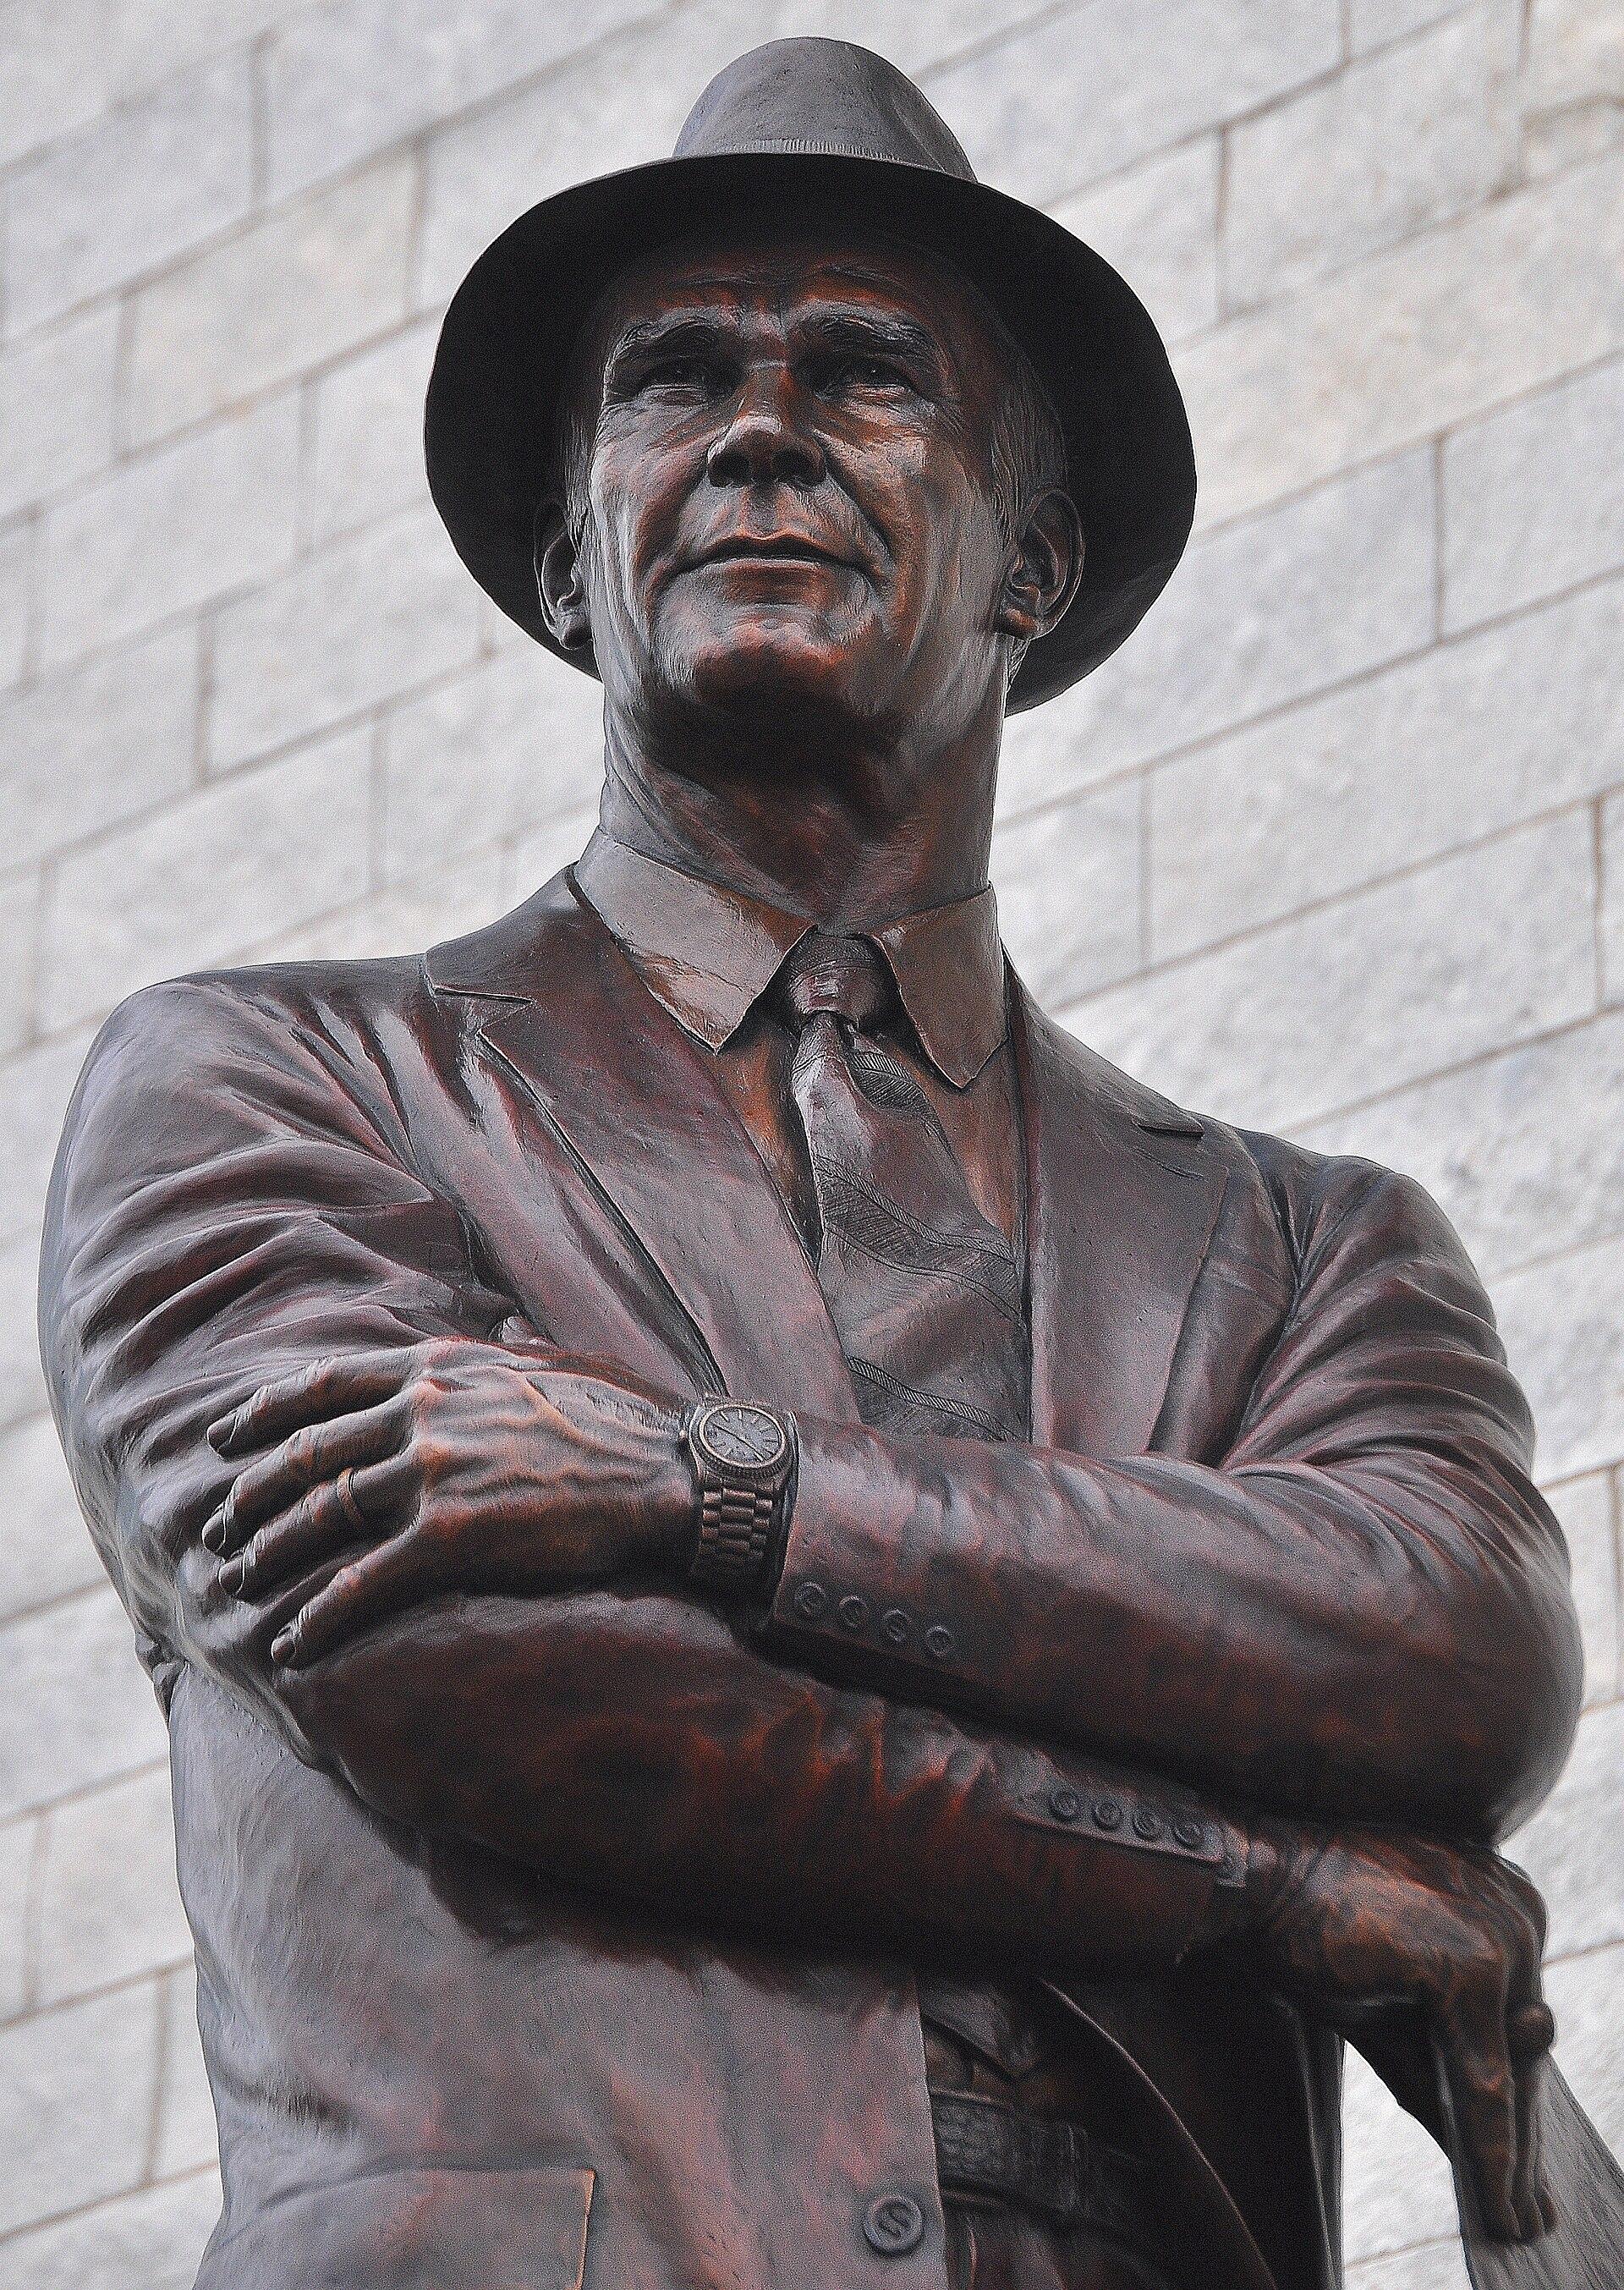 thumb stolen tom statue